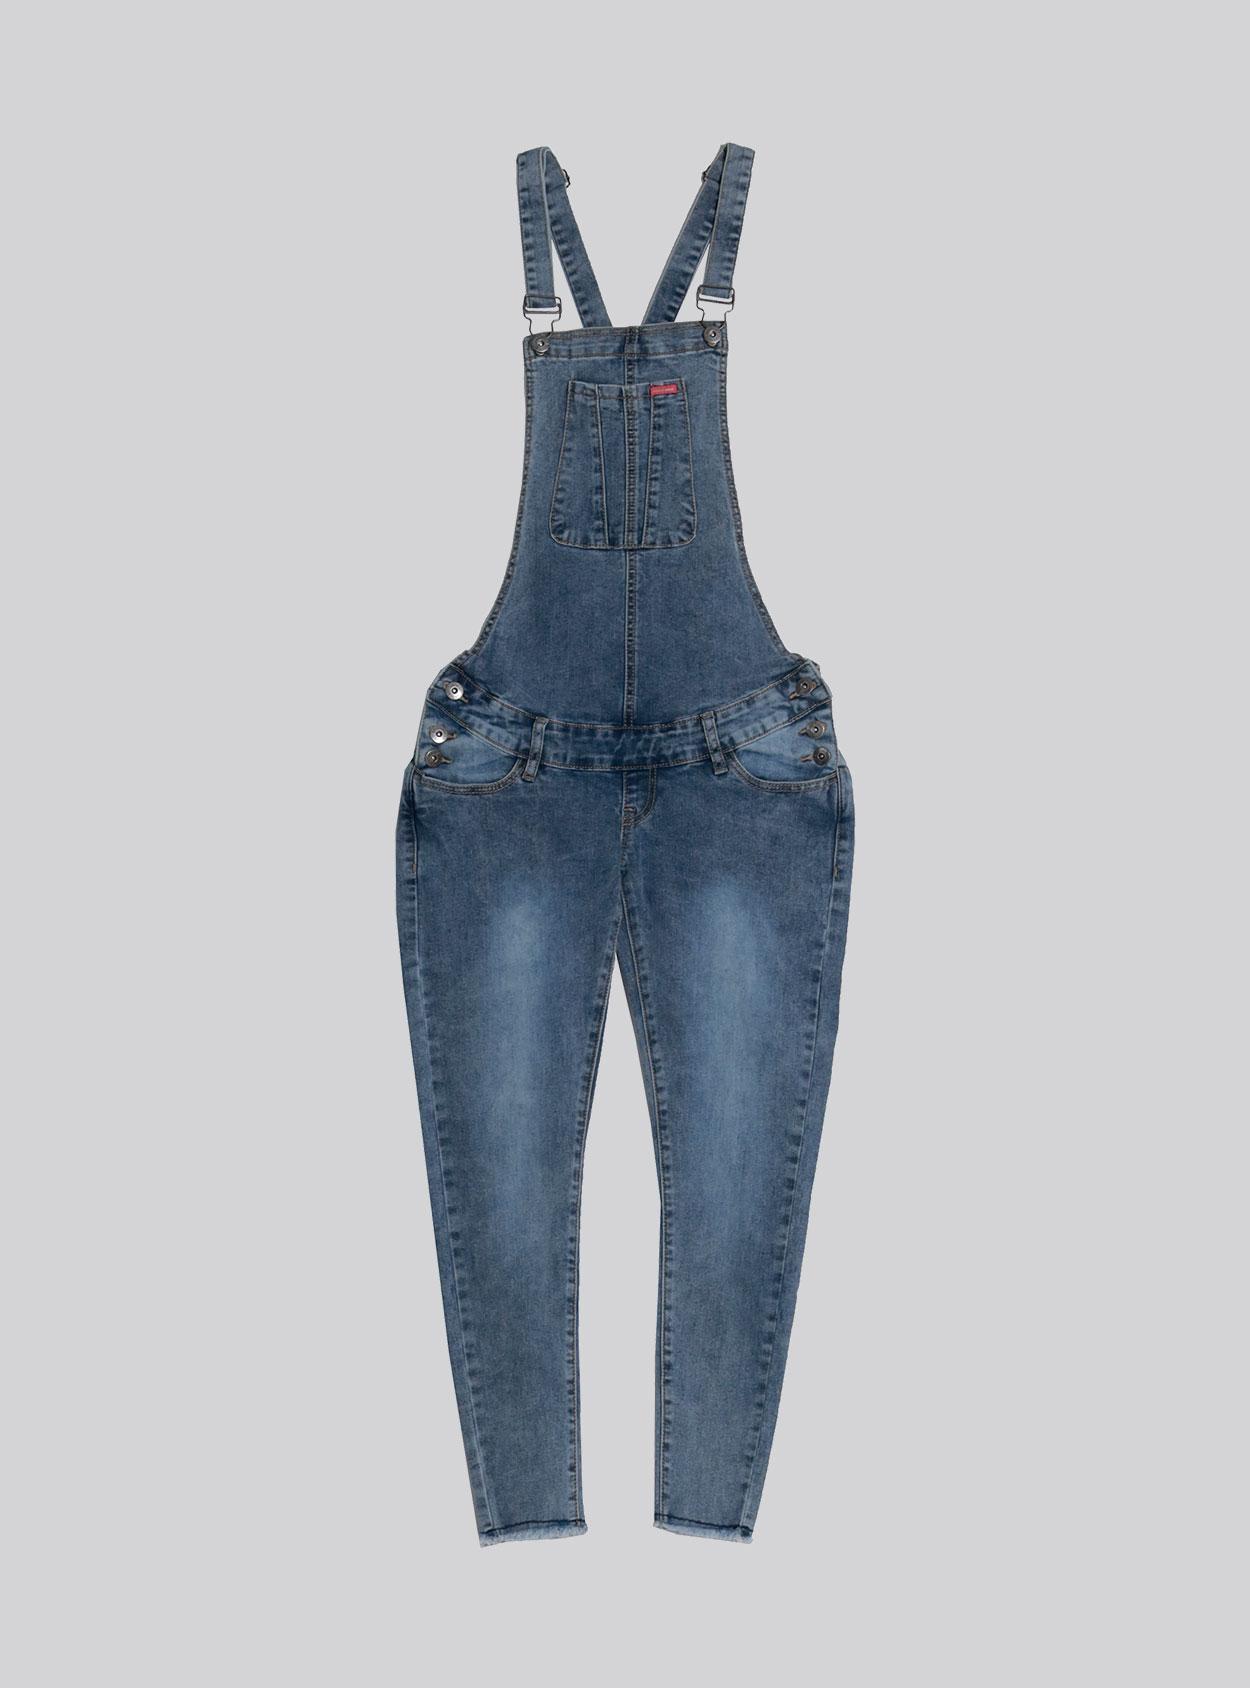 Jardinera jeans claro